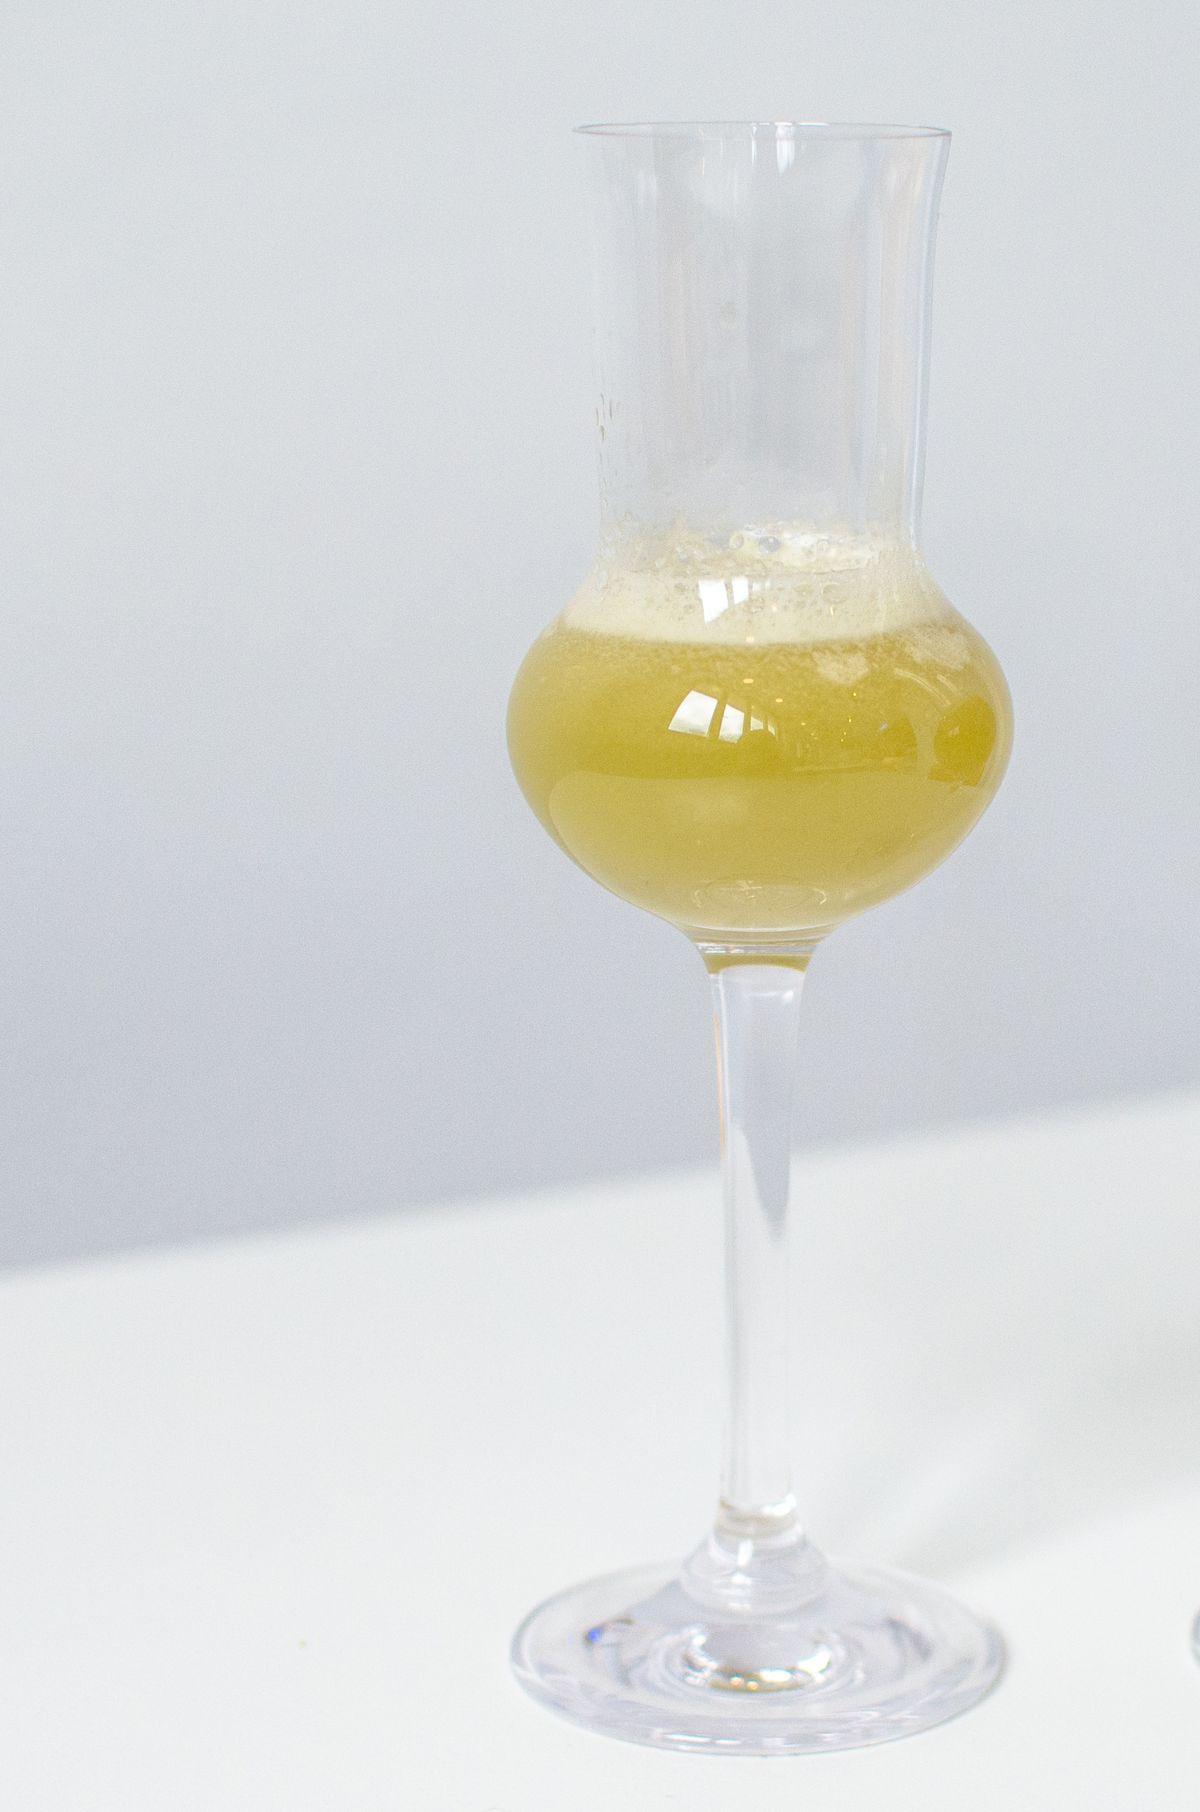 A mezcal cocktail at Celeste (mint, cucumber, Juice Union pineapple juice)